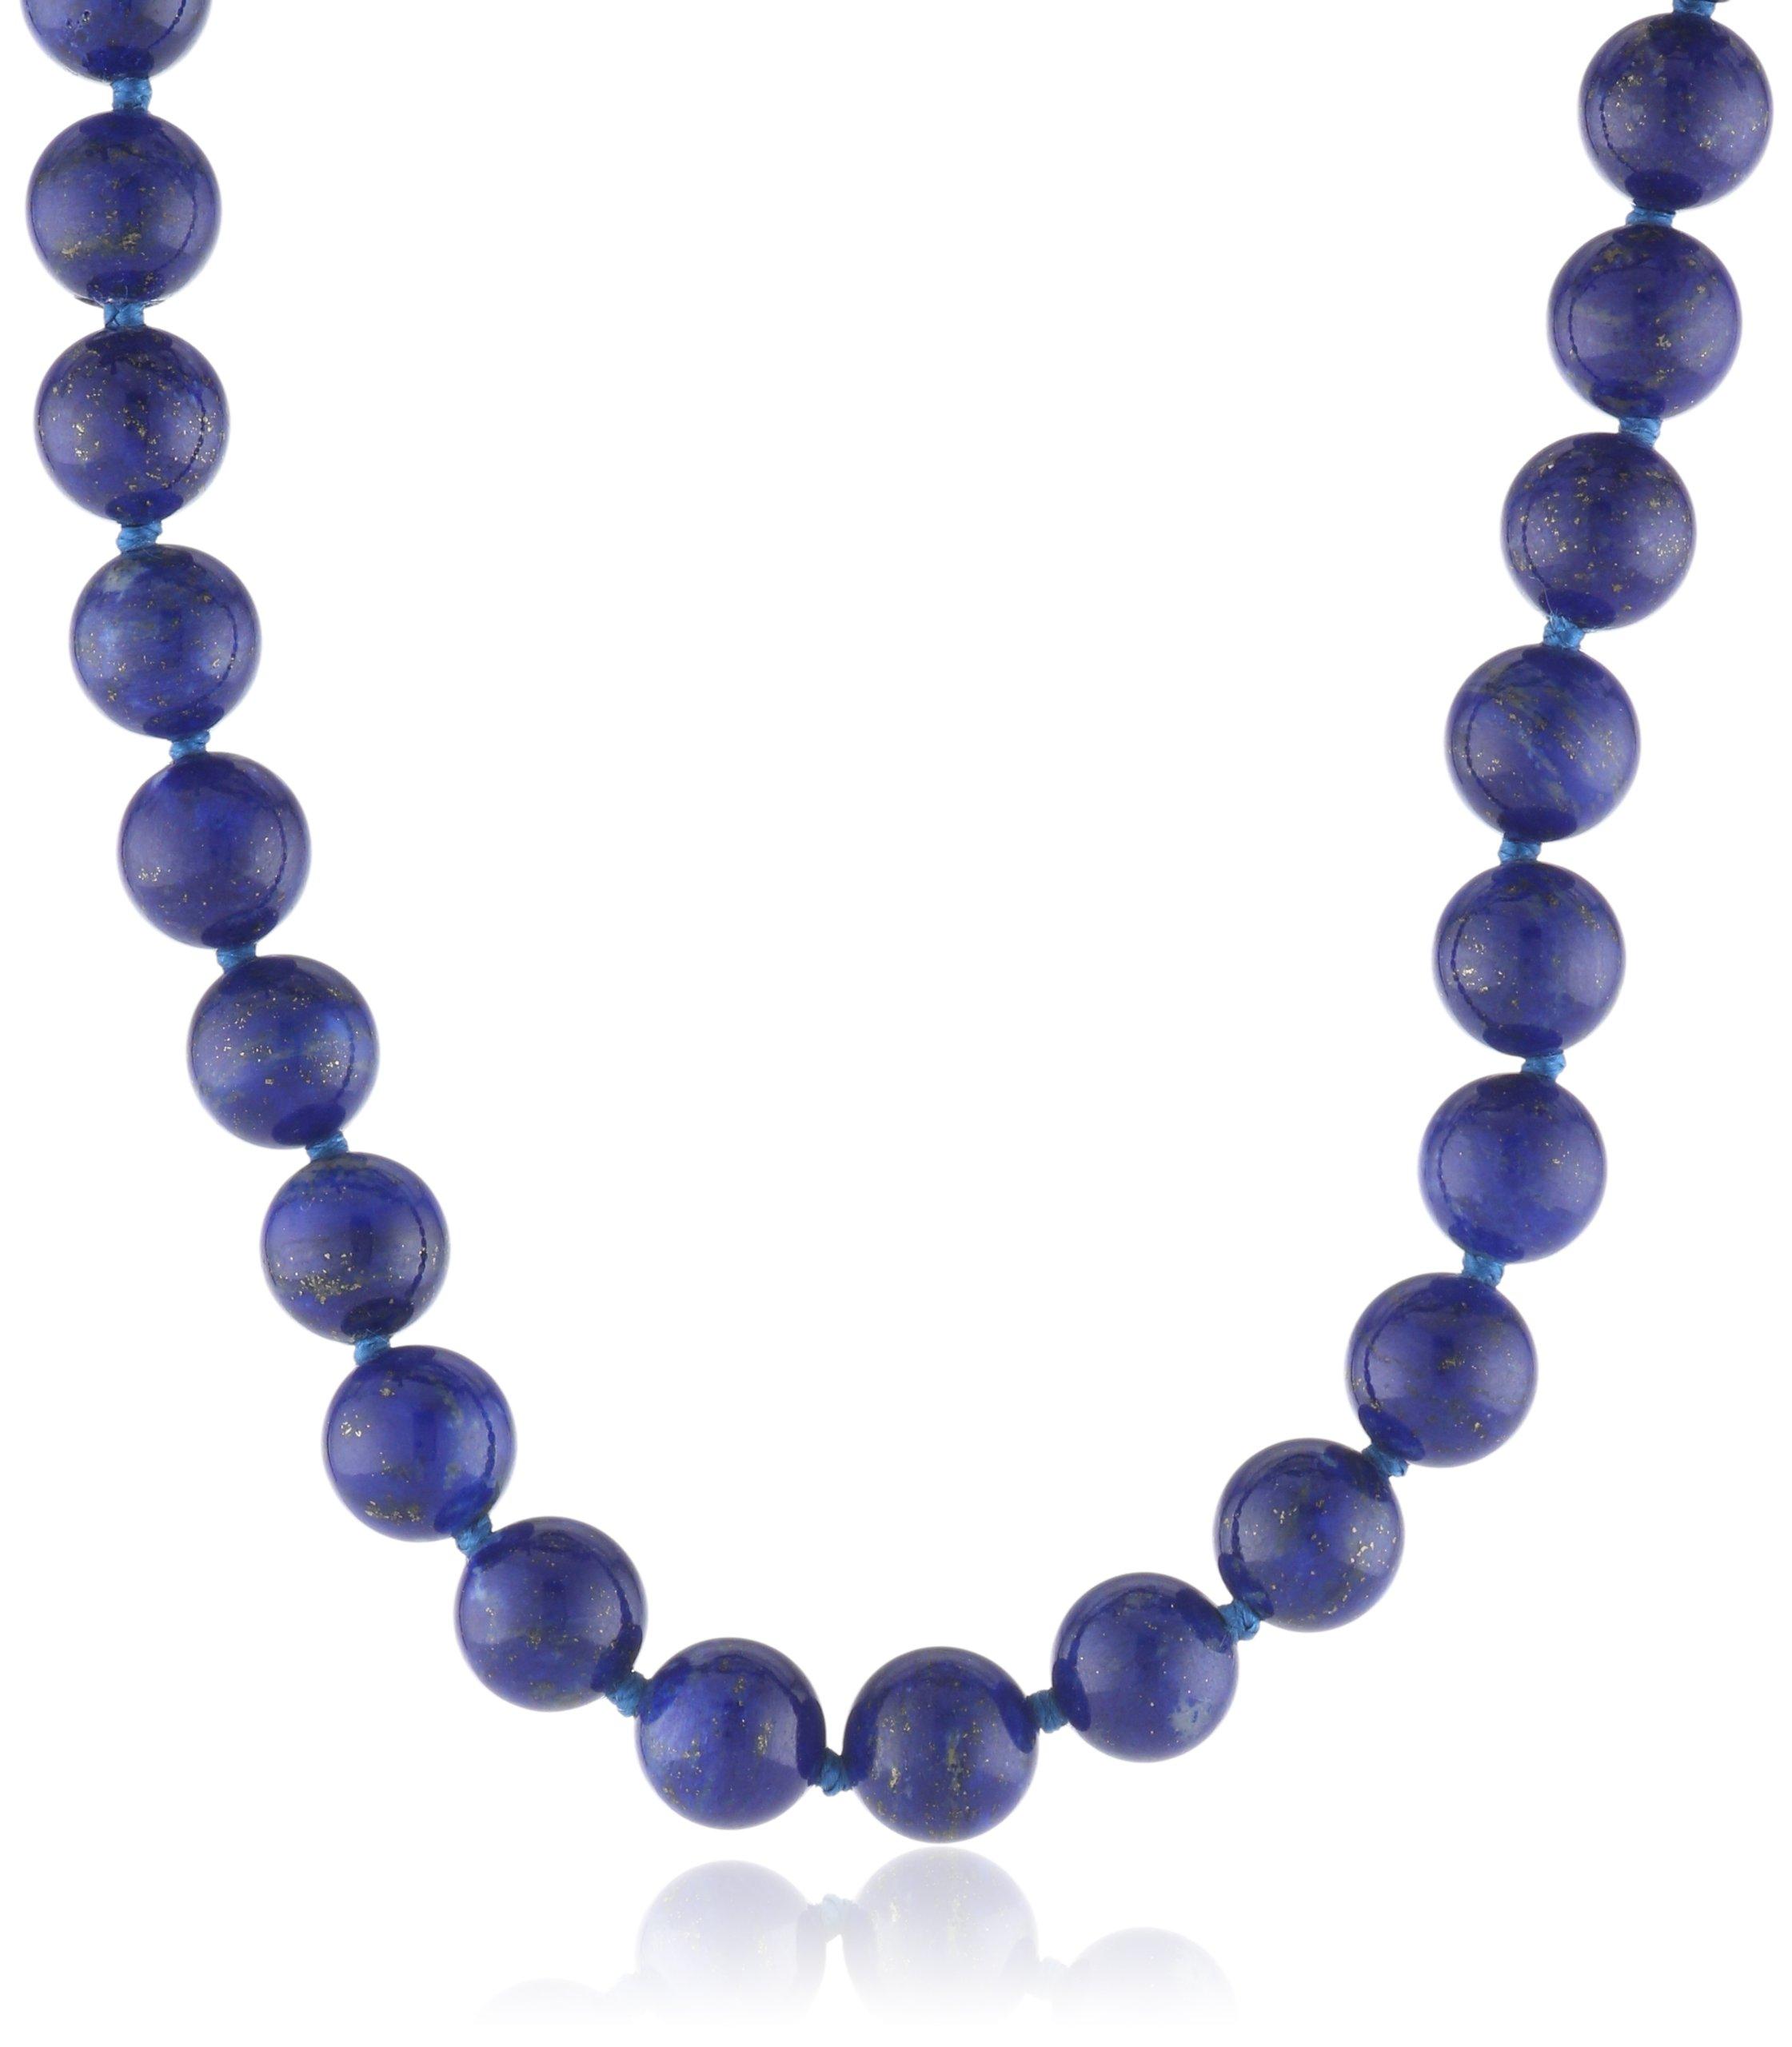 14k Yellow Gold 8mm Lapis Lazuli Bead Necklace, 17''